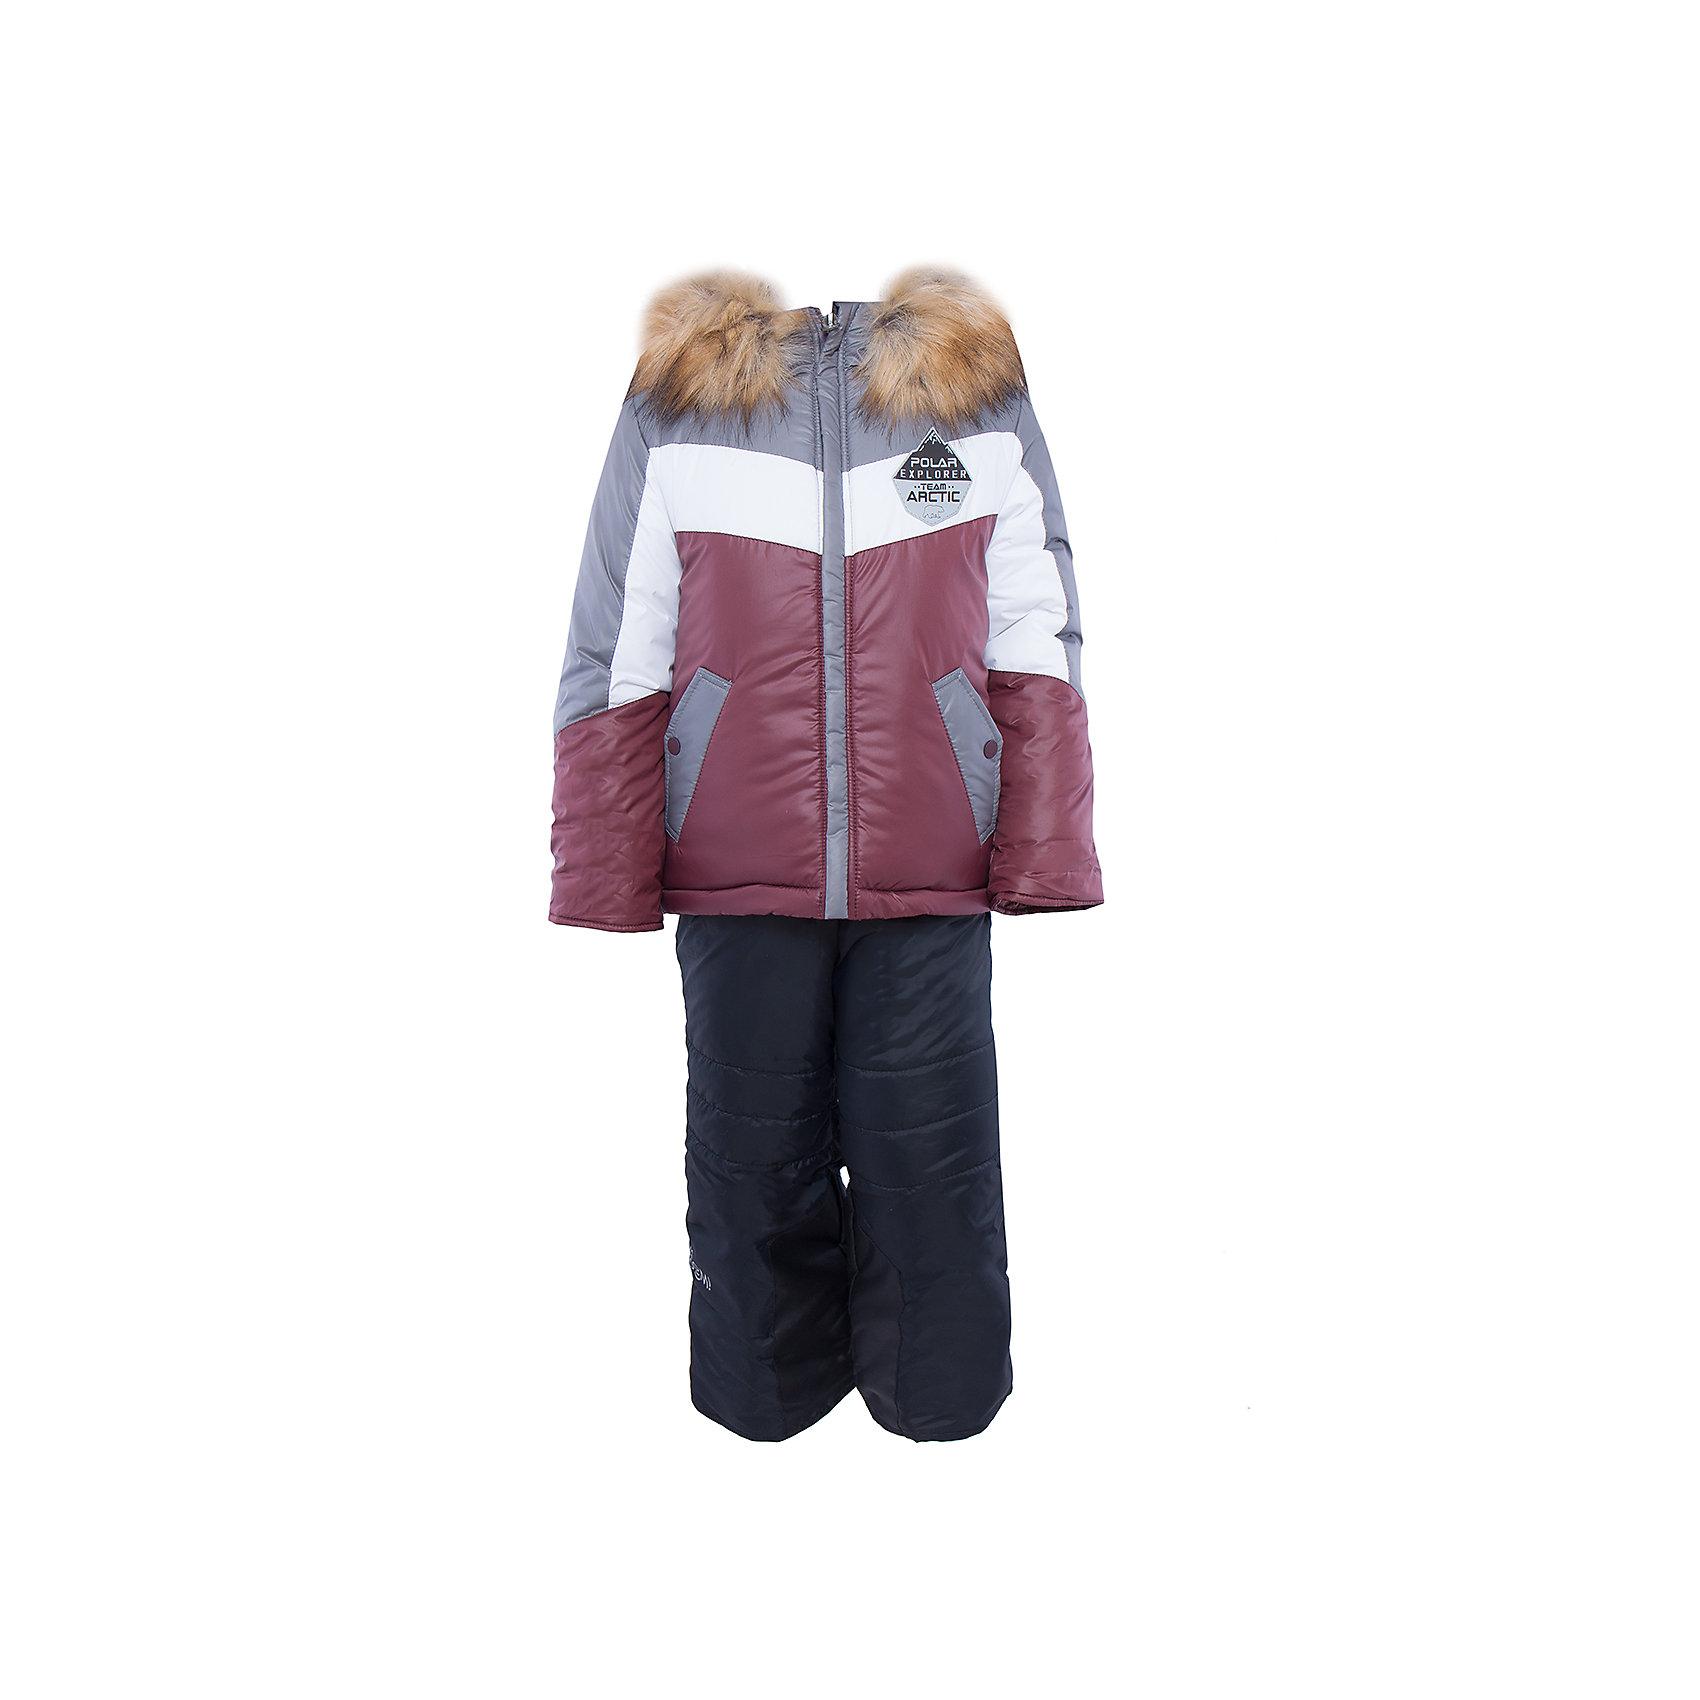 BOOM by Orby Комплект: куртка и брюки для мальчика BOOM by Orby boom by orby комплект курта и брюки для девочки boom by orby